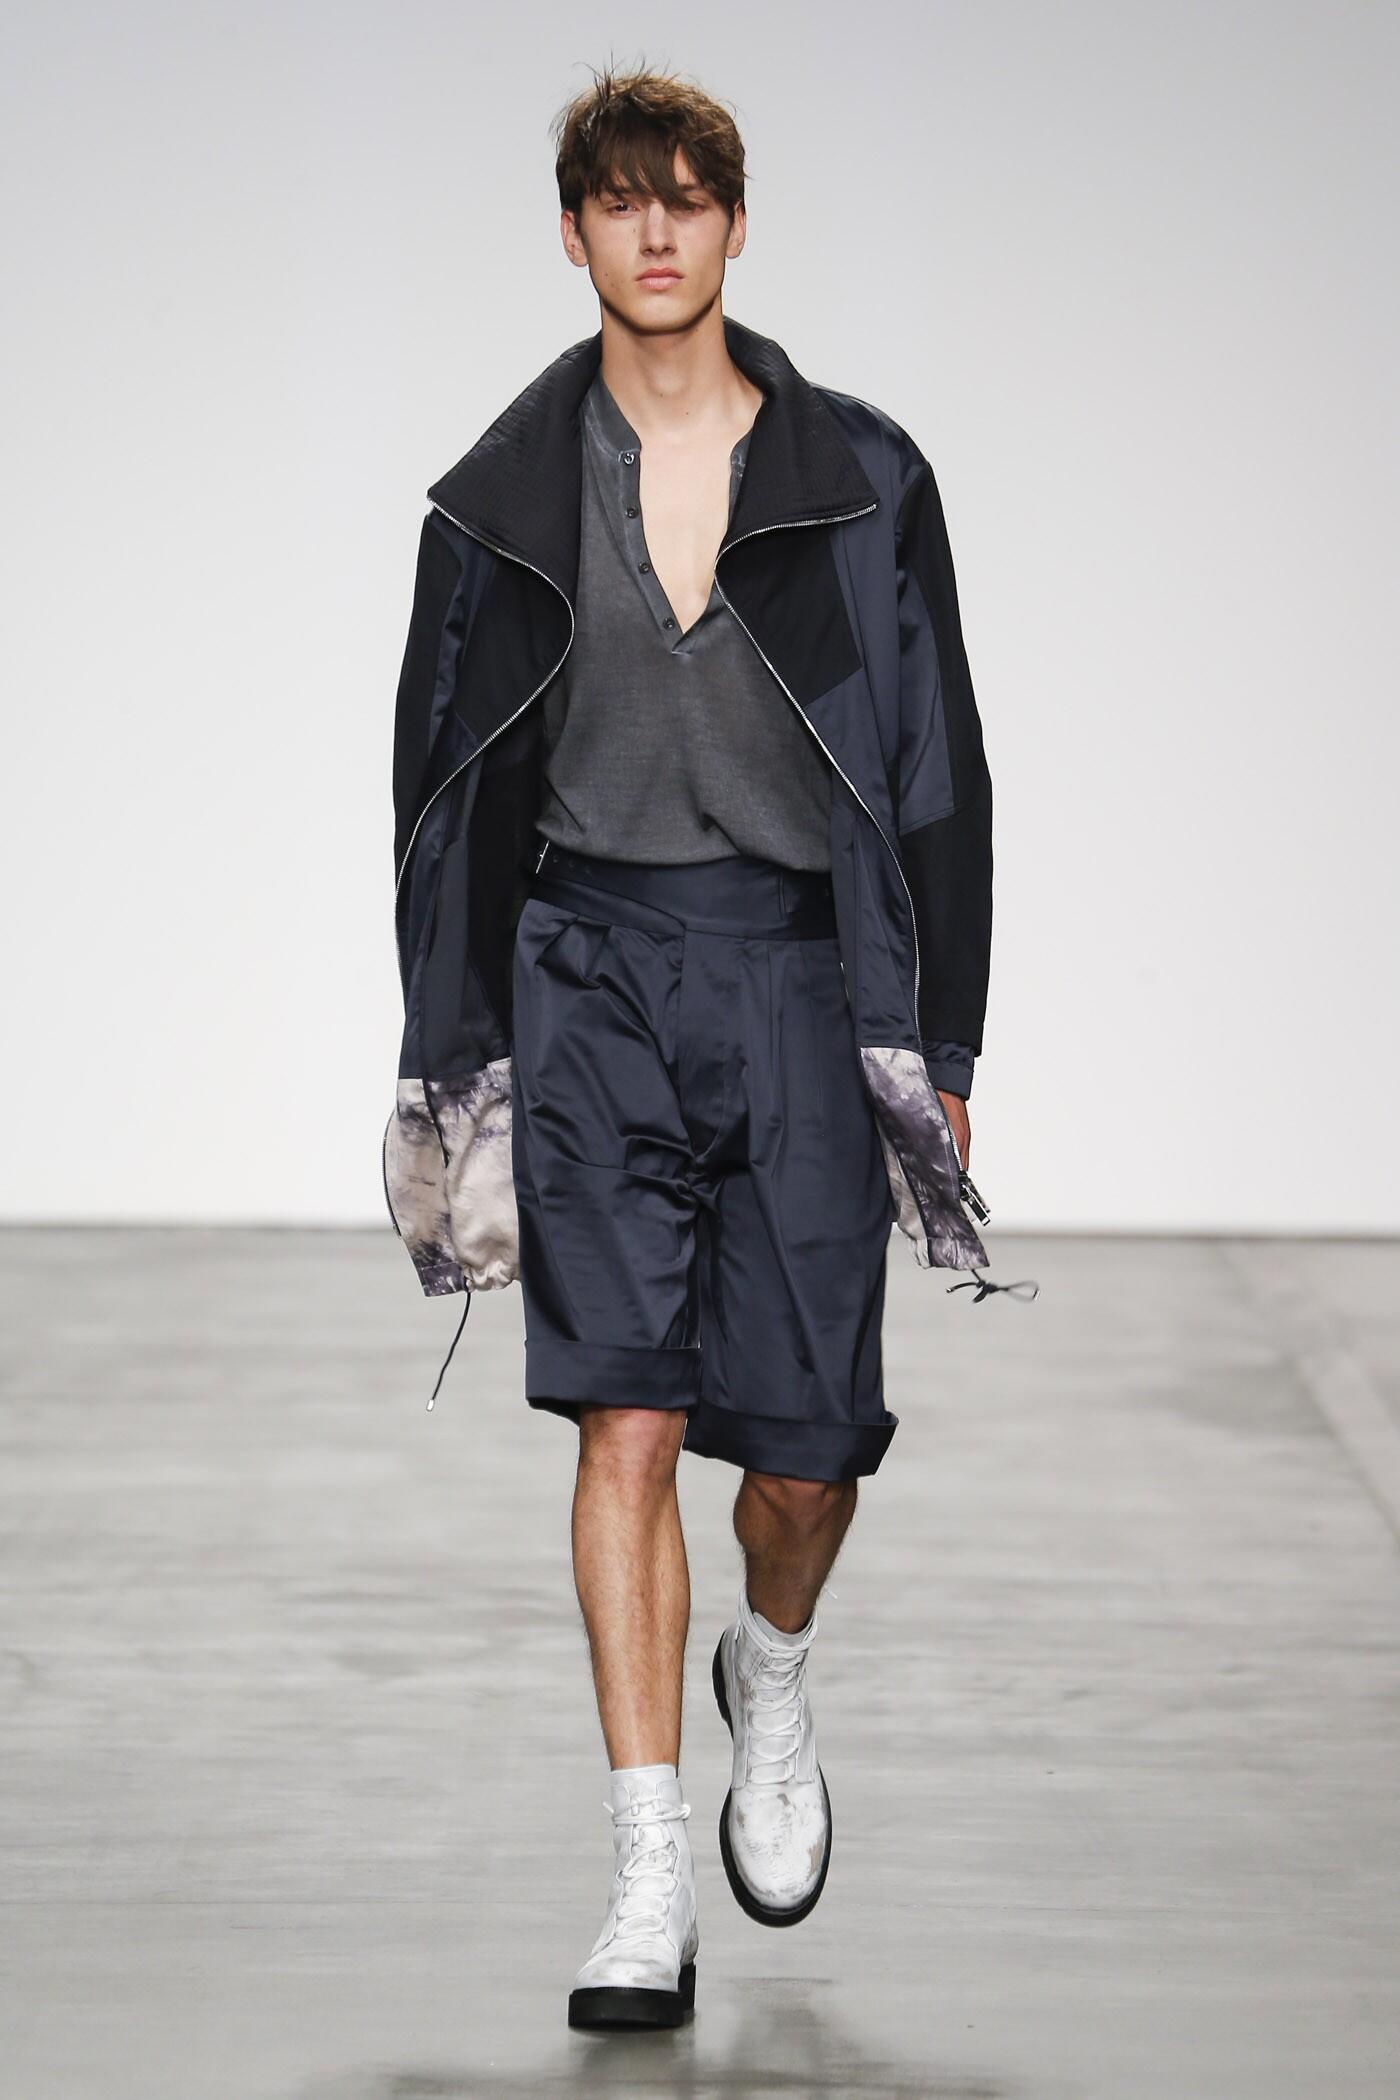 Summer Fashion Trends 2015 Iceberg